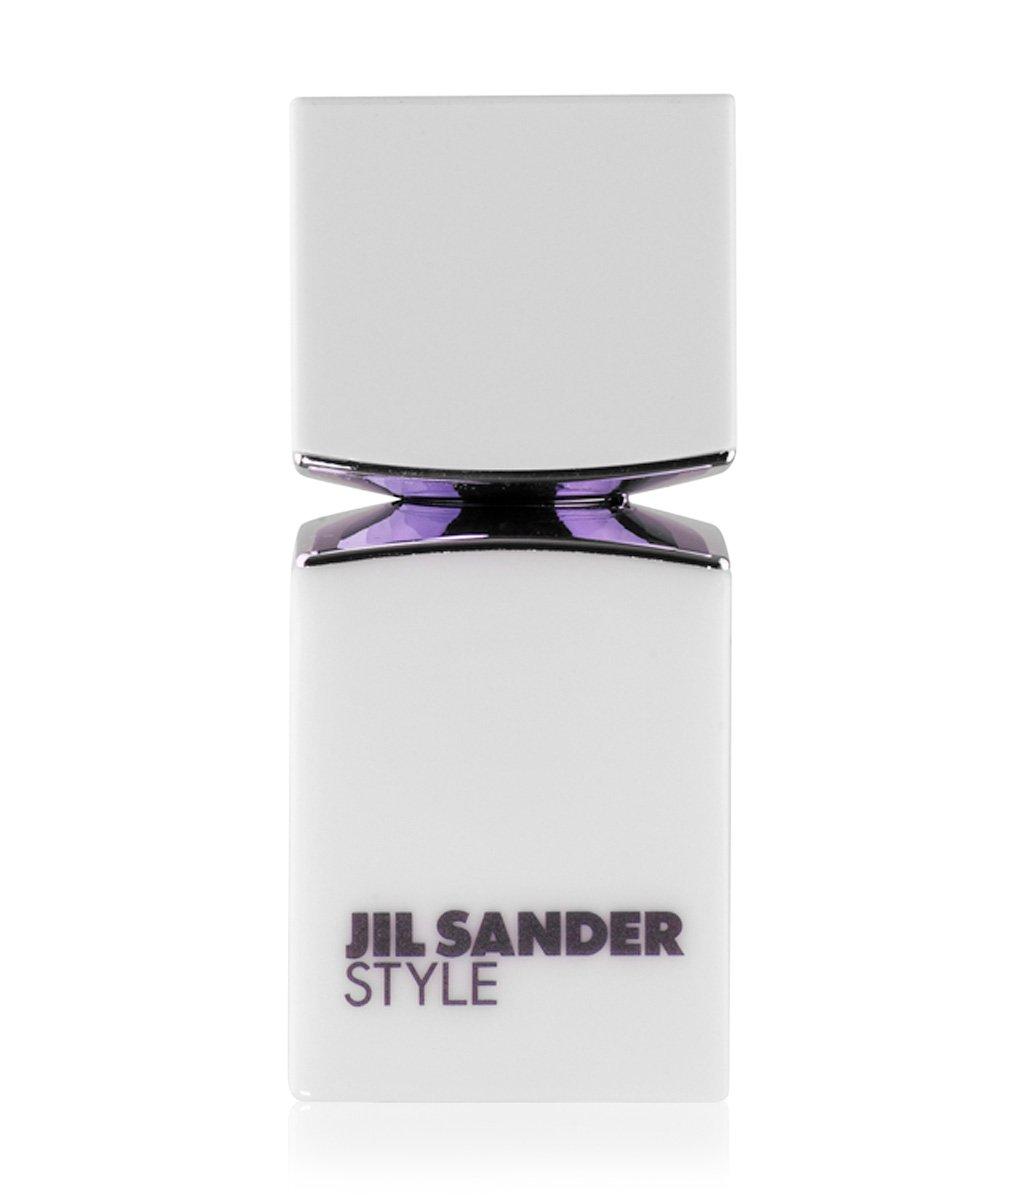 jil sander style parfum bestellen gratisversand flaconi. Black Bedroom Furniture Sets. Home Design Ideas